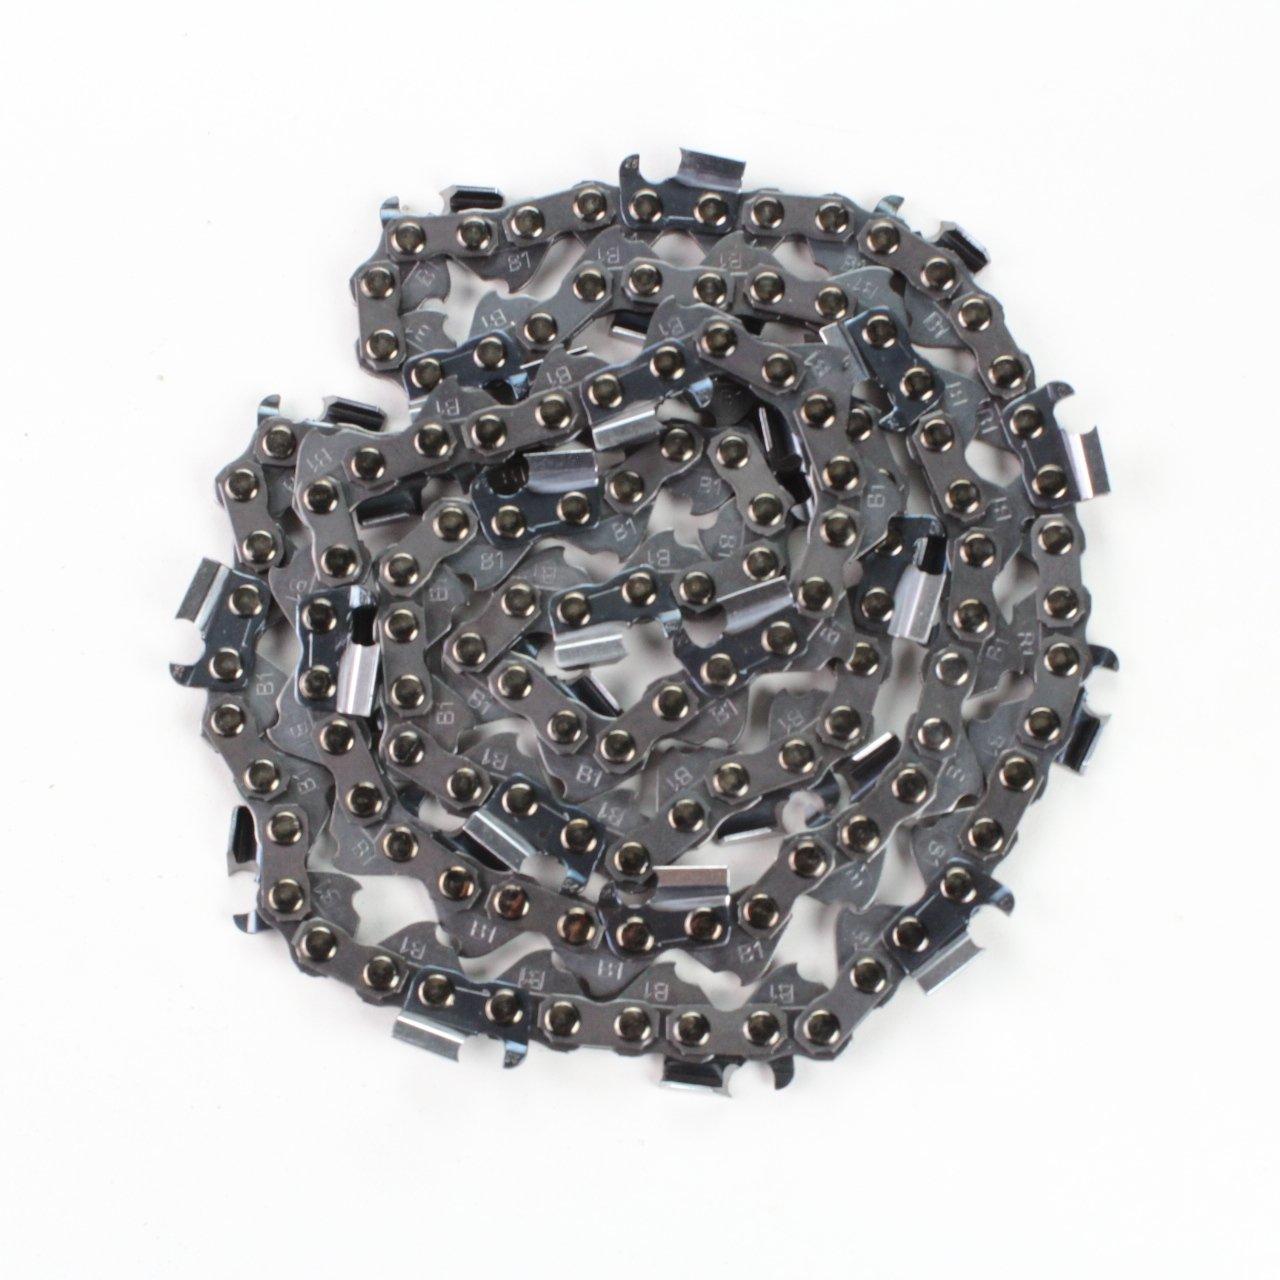 2 Pack 16 Echo Chainsaw Chain Loop .325 0.050 Chisel 66 DL CS-500P CS-520 Niche Industries